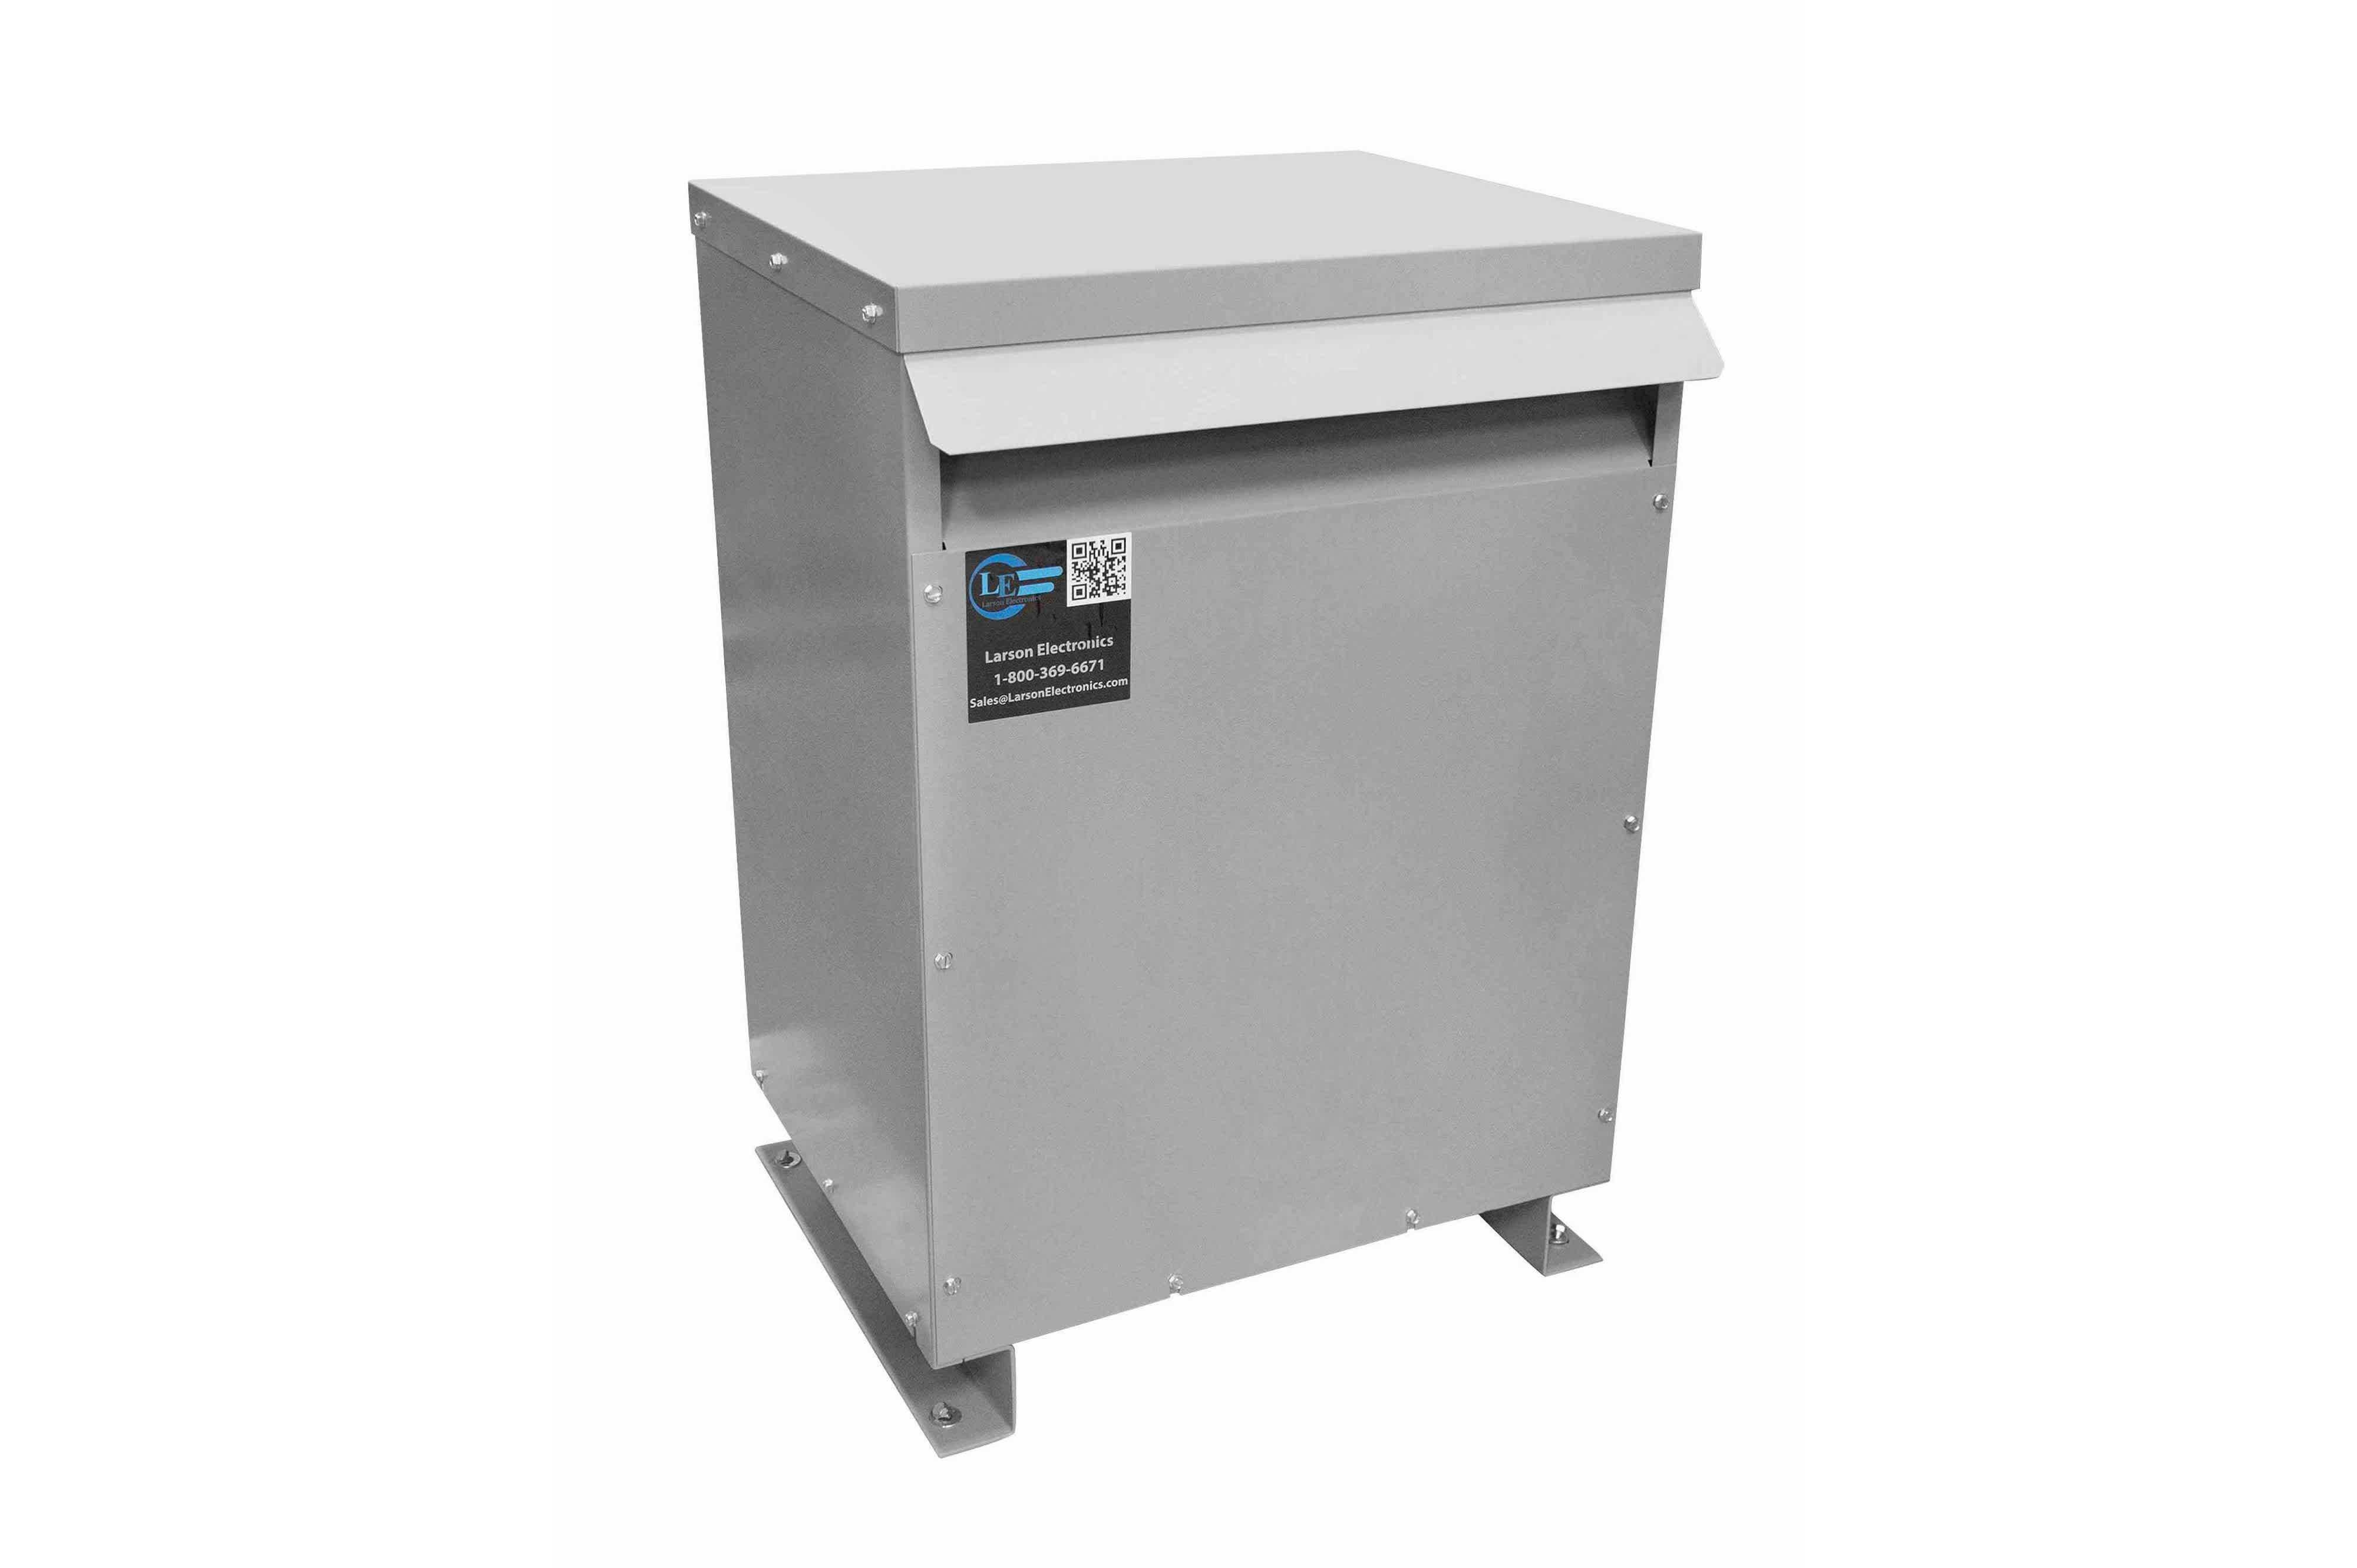 700 kVA 3PH Isolation Transformer, 240V Wye Primary, 480V Delta Secondary, N3R, Ventilated, 60 Hz